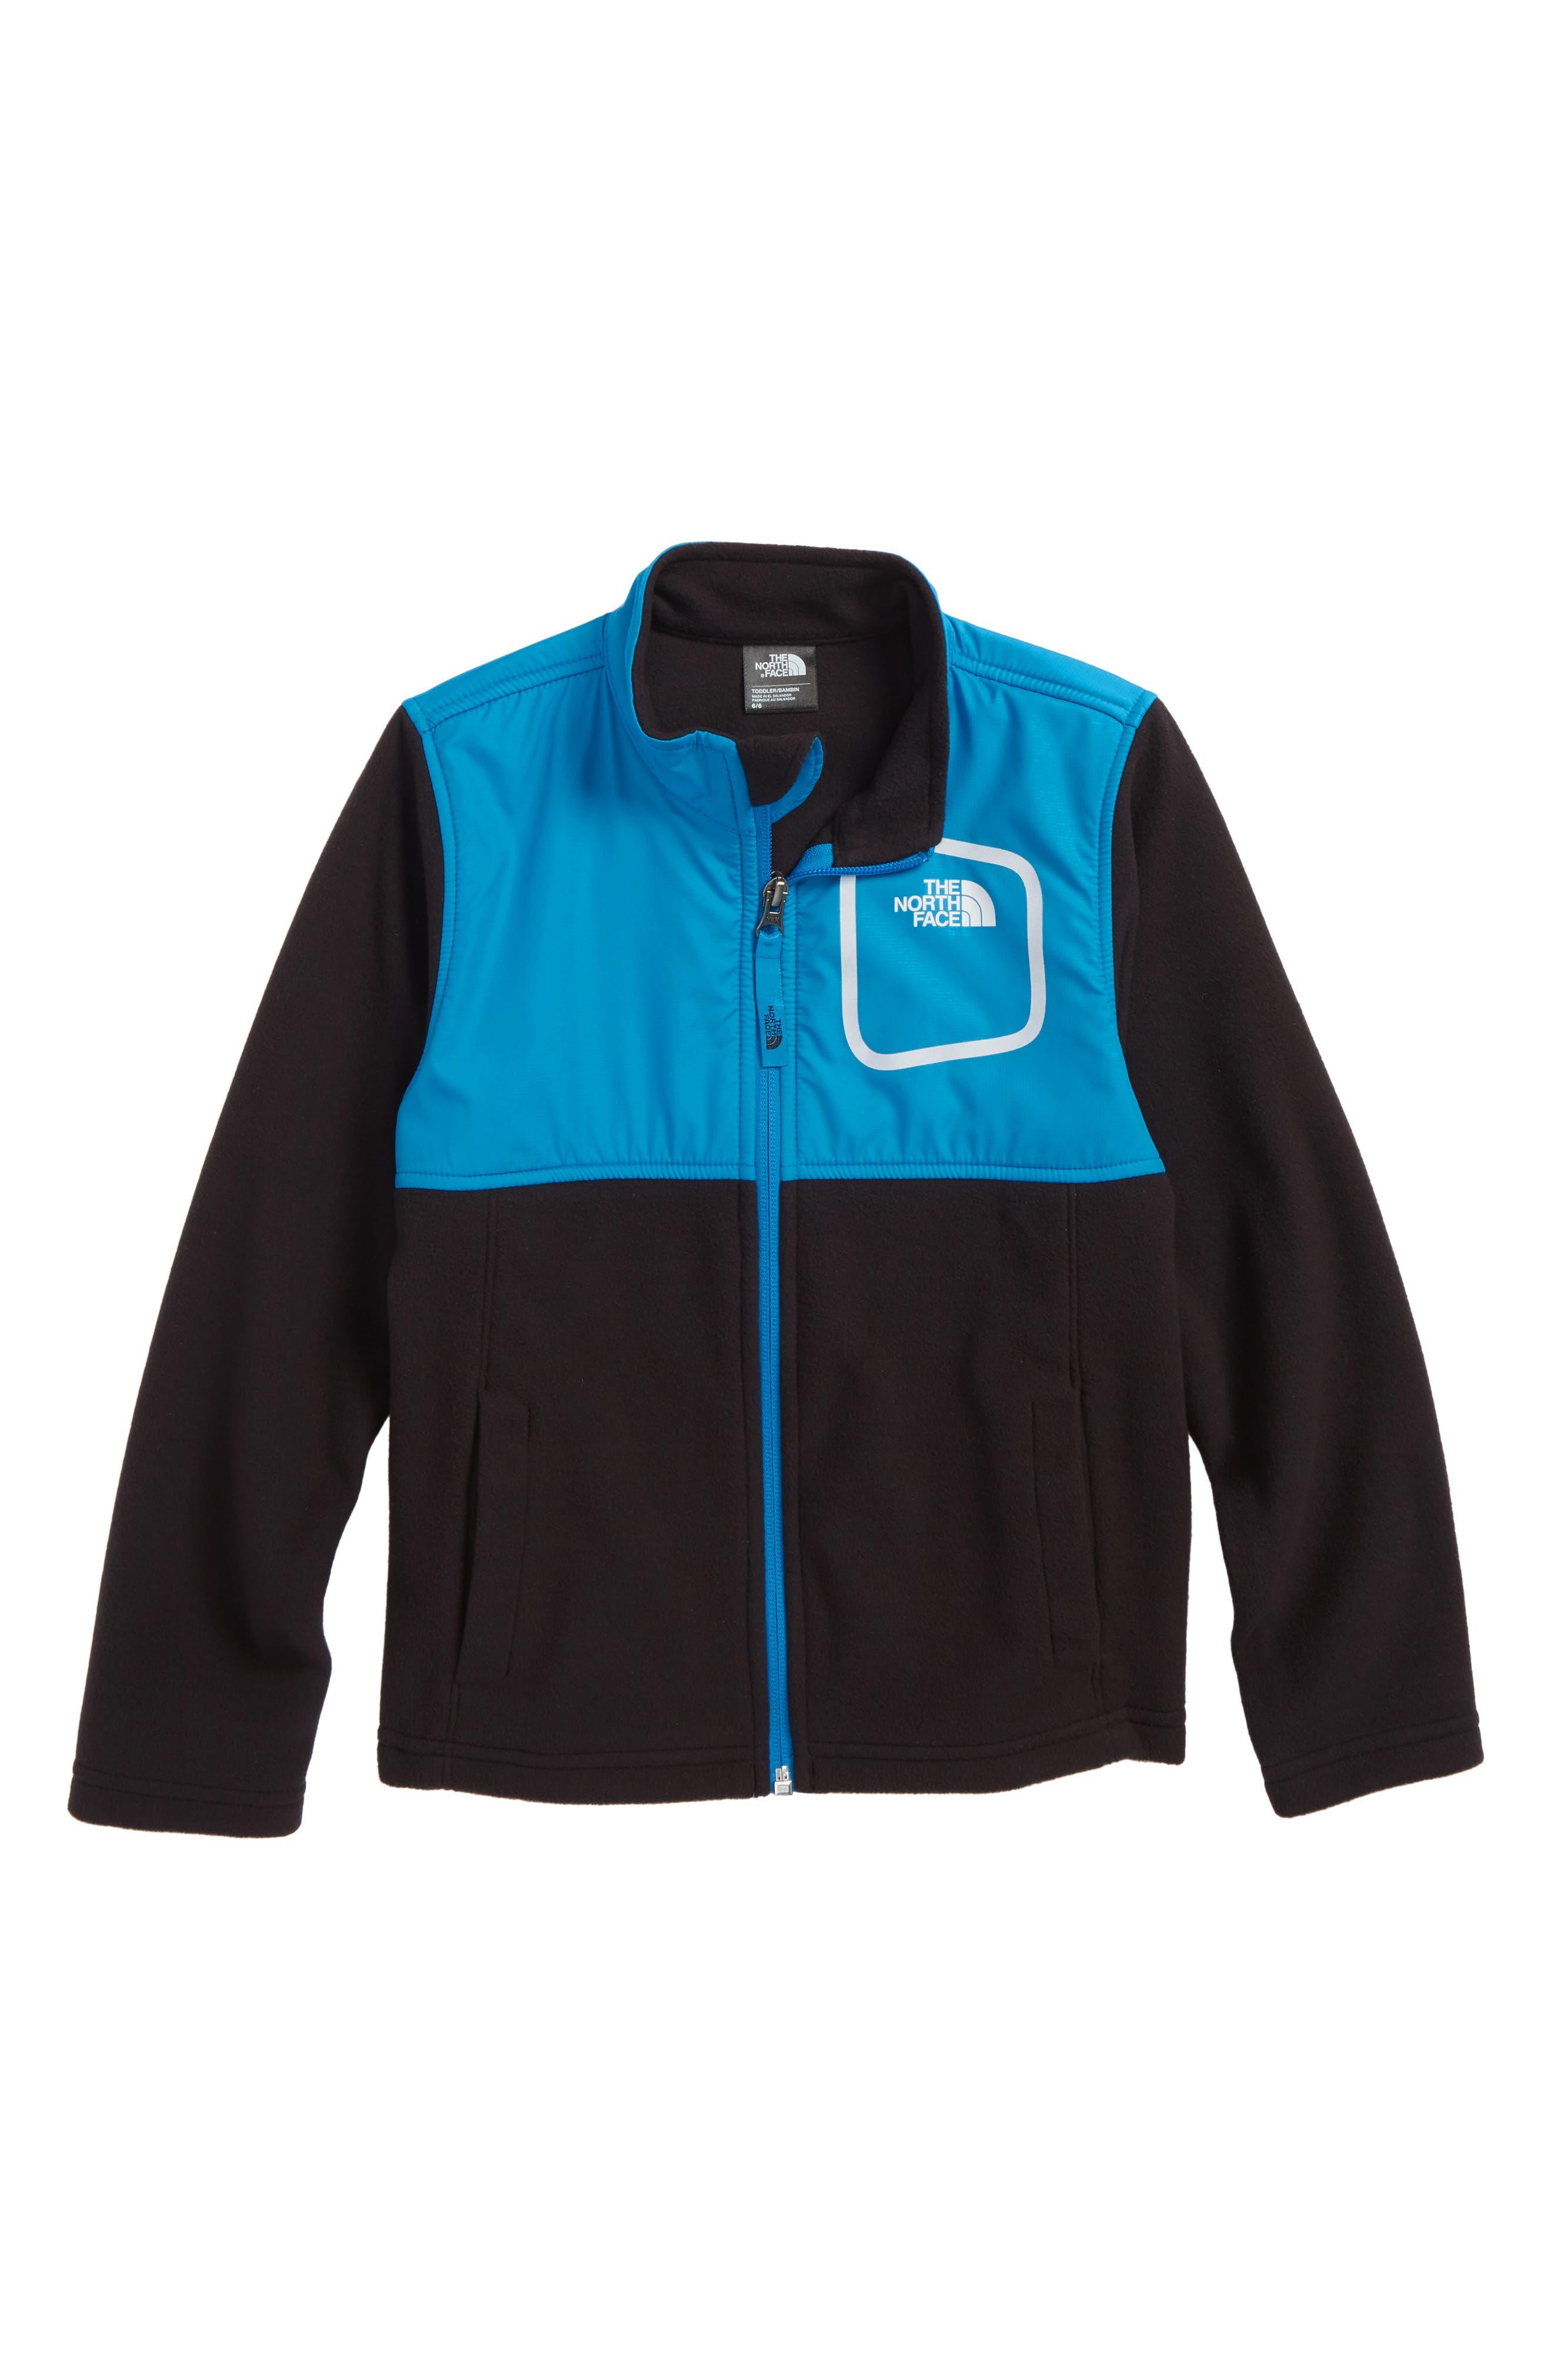 THE NORTH FACE,                             Peril Glacier Microfleece Track Jacket,                             Main thumbnail 1, color,                             420